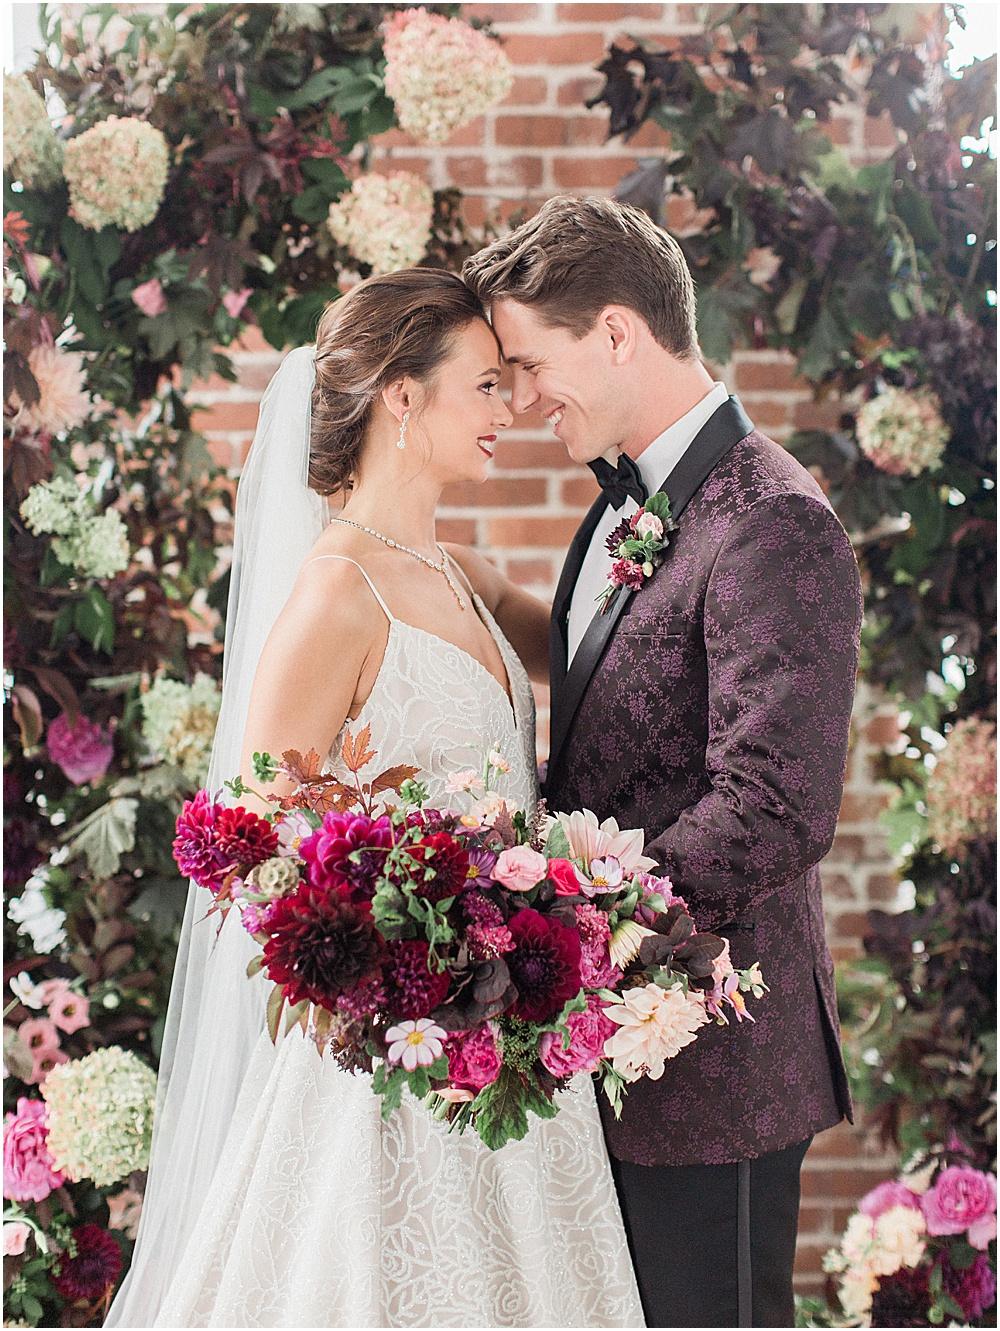 styled_shoot_fall_valentines_day_wedding_rhodi_island_ma_boston_wedding_photographyer_meredith_jane_photography_photo_0020.jpg